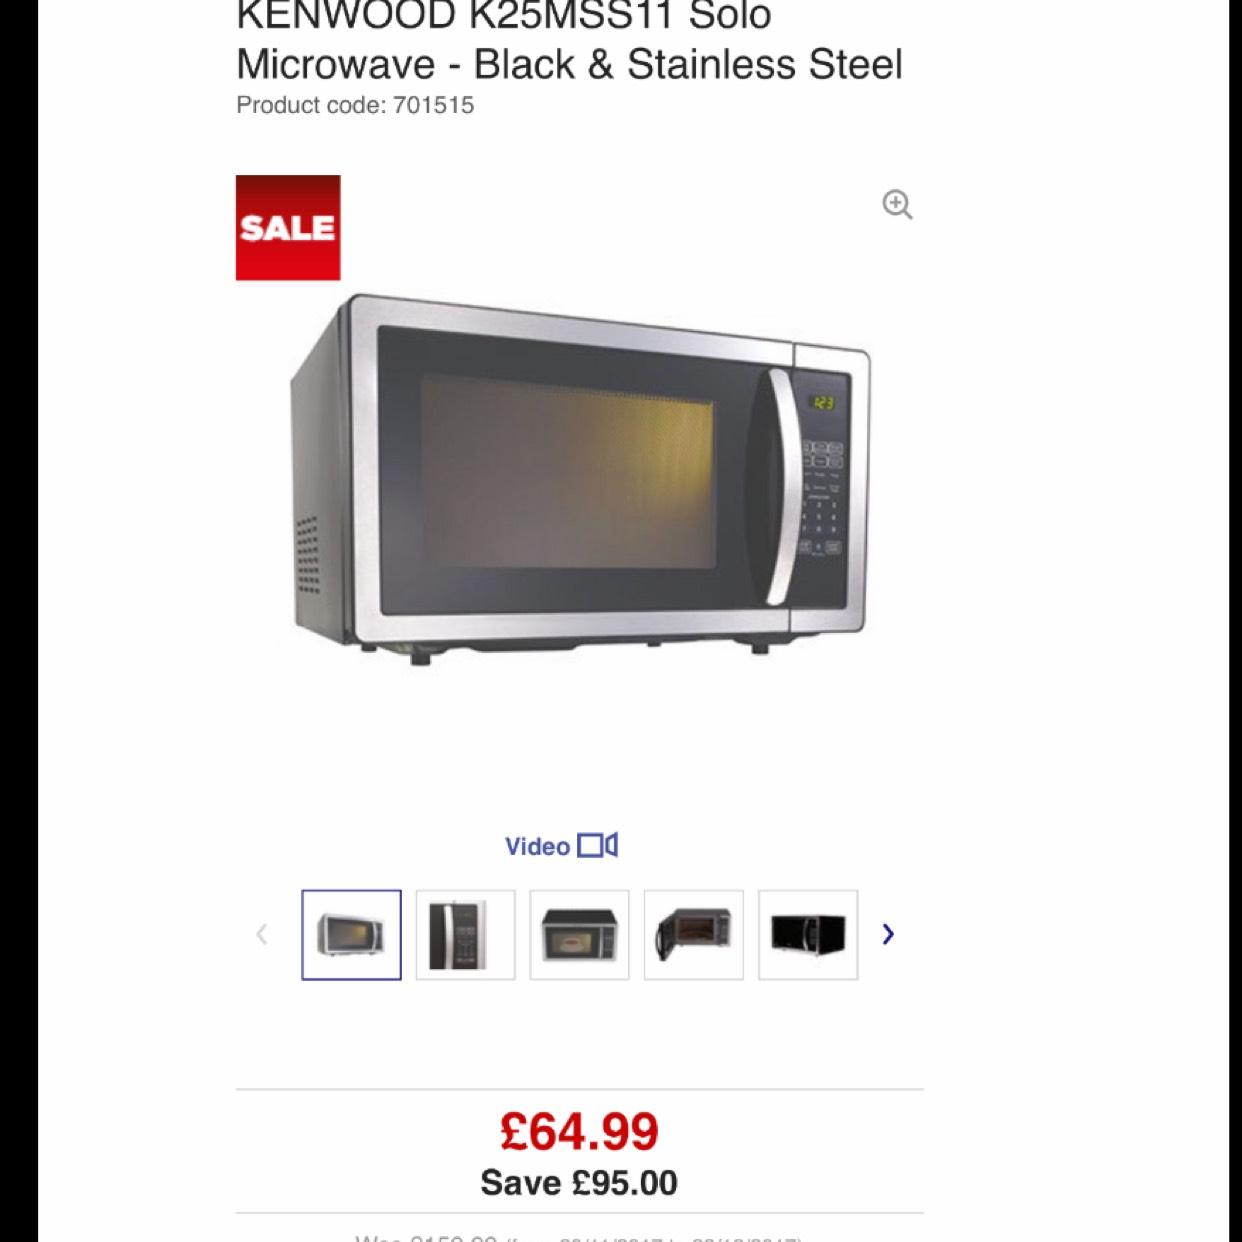 Kenwood K25MSS11 Microwave £64.99 @ Currys